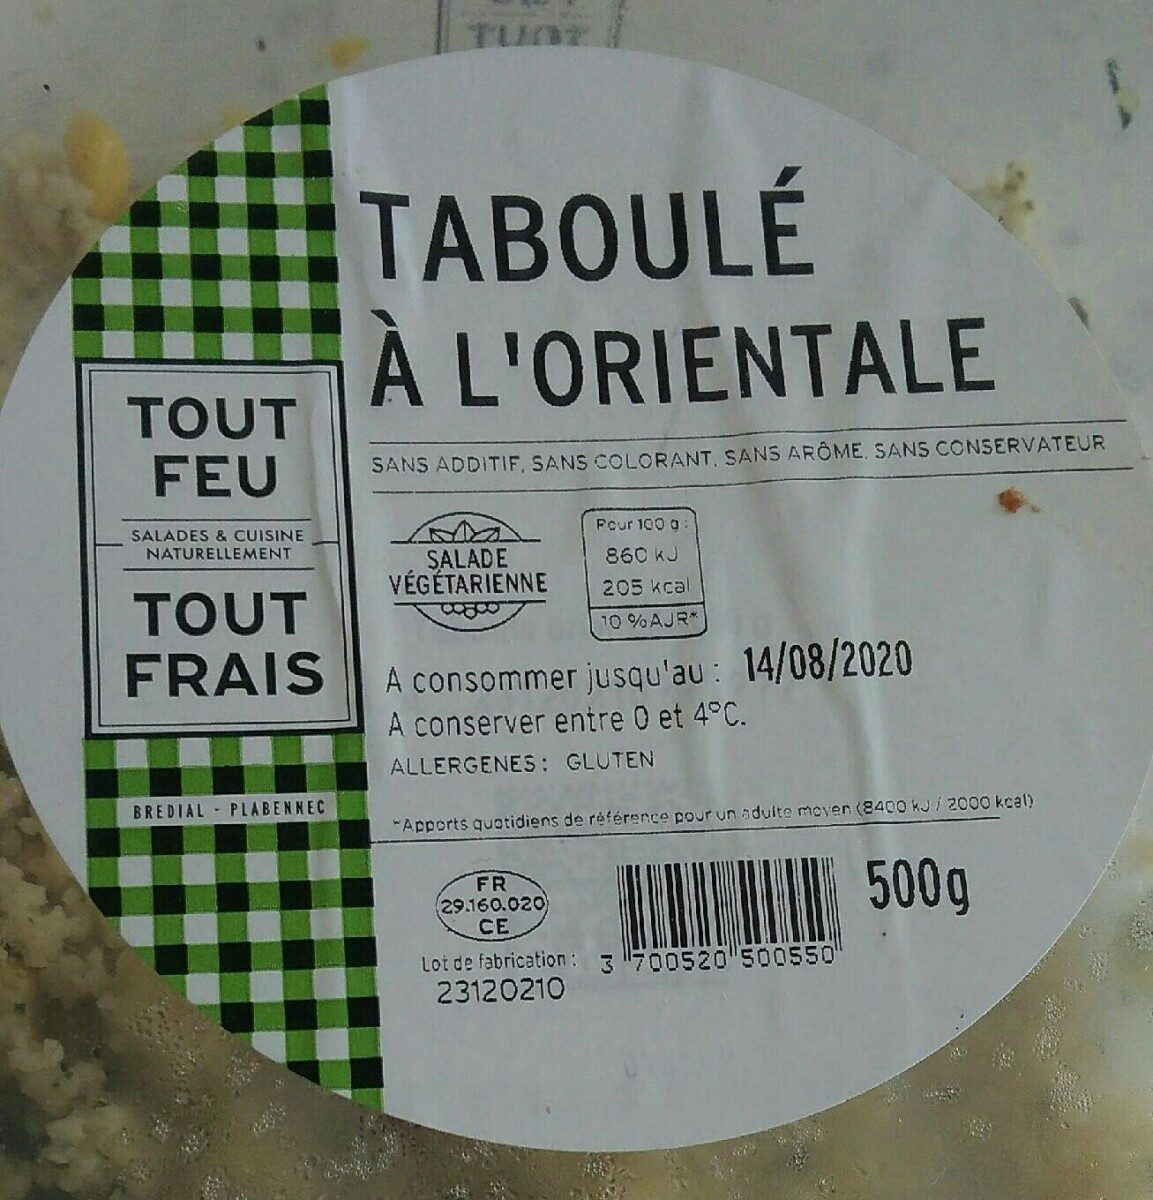 Taboule a l'orientale BREDIAL - Informations nutritionnelles - fr